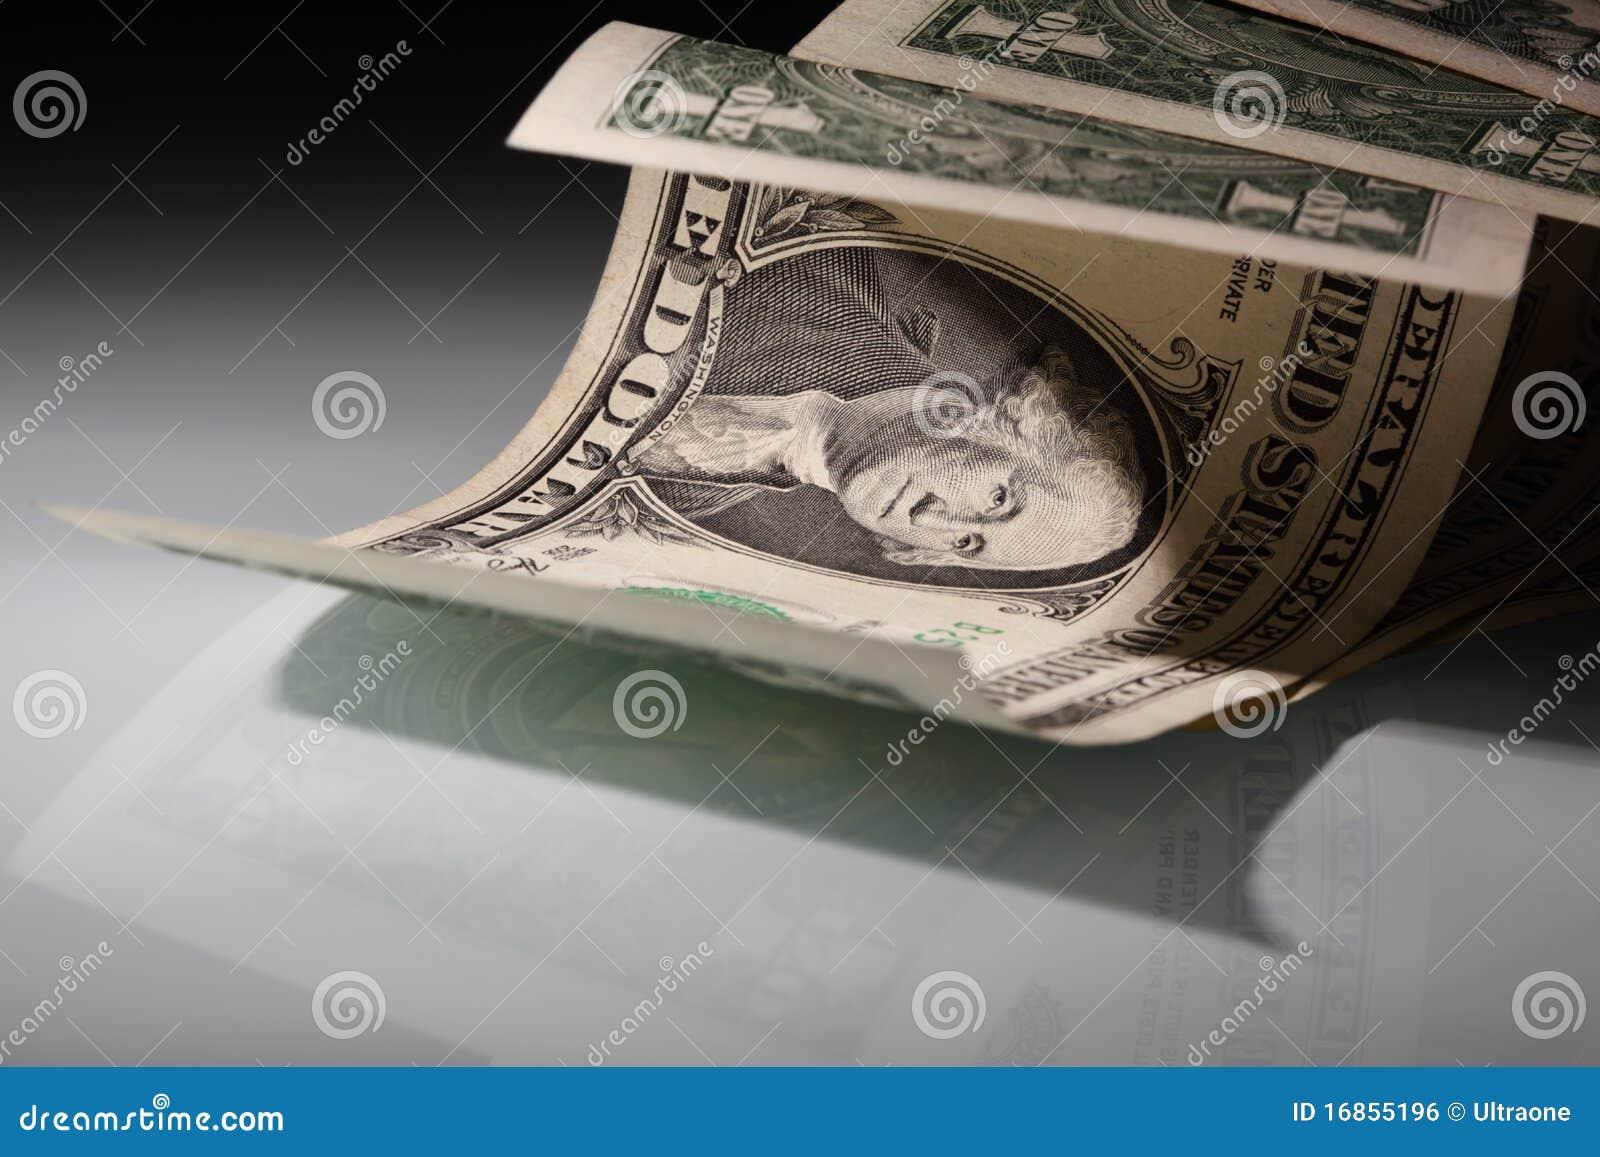 Argent. Dollars US Dans floodlit.